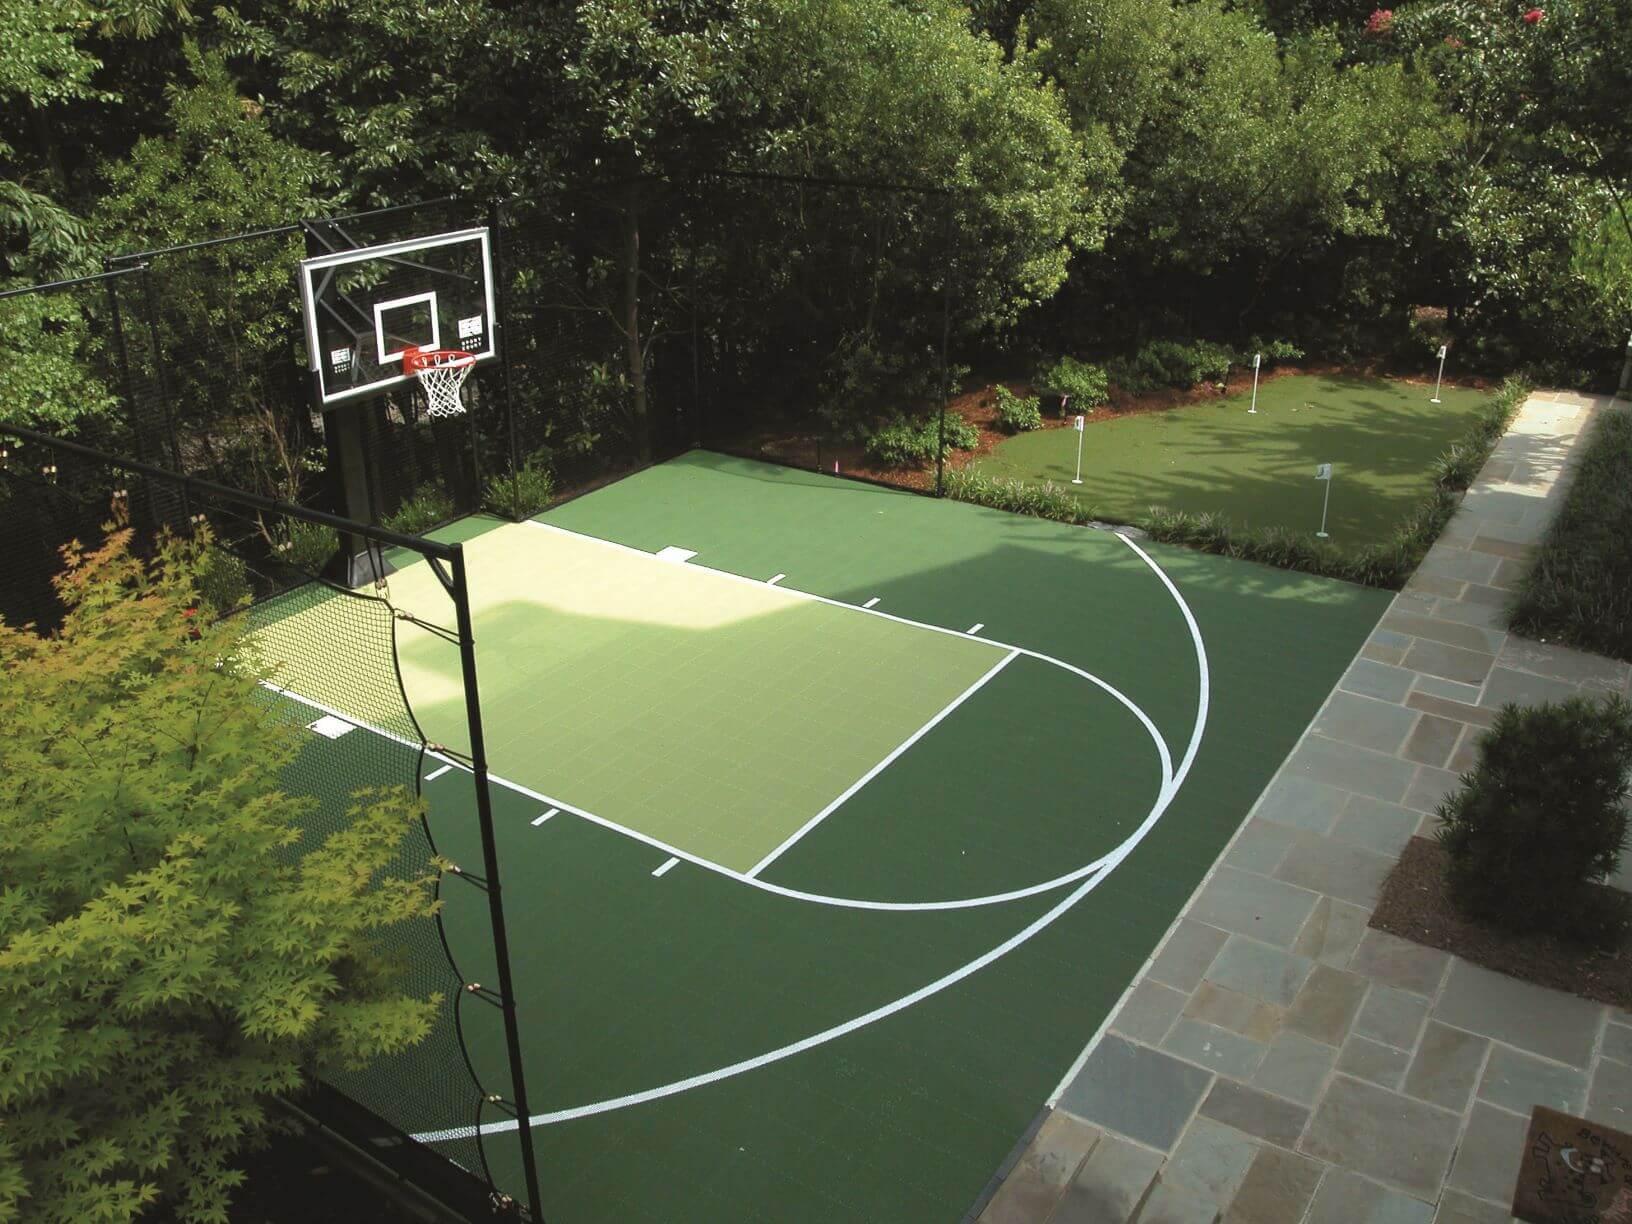 Backyard Sport Court Basketball Court Green and Kiwi